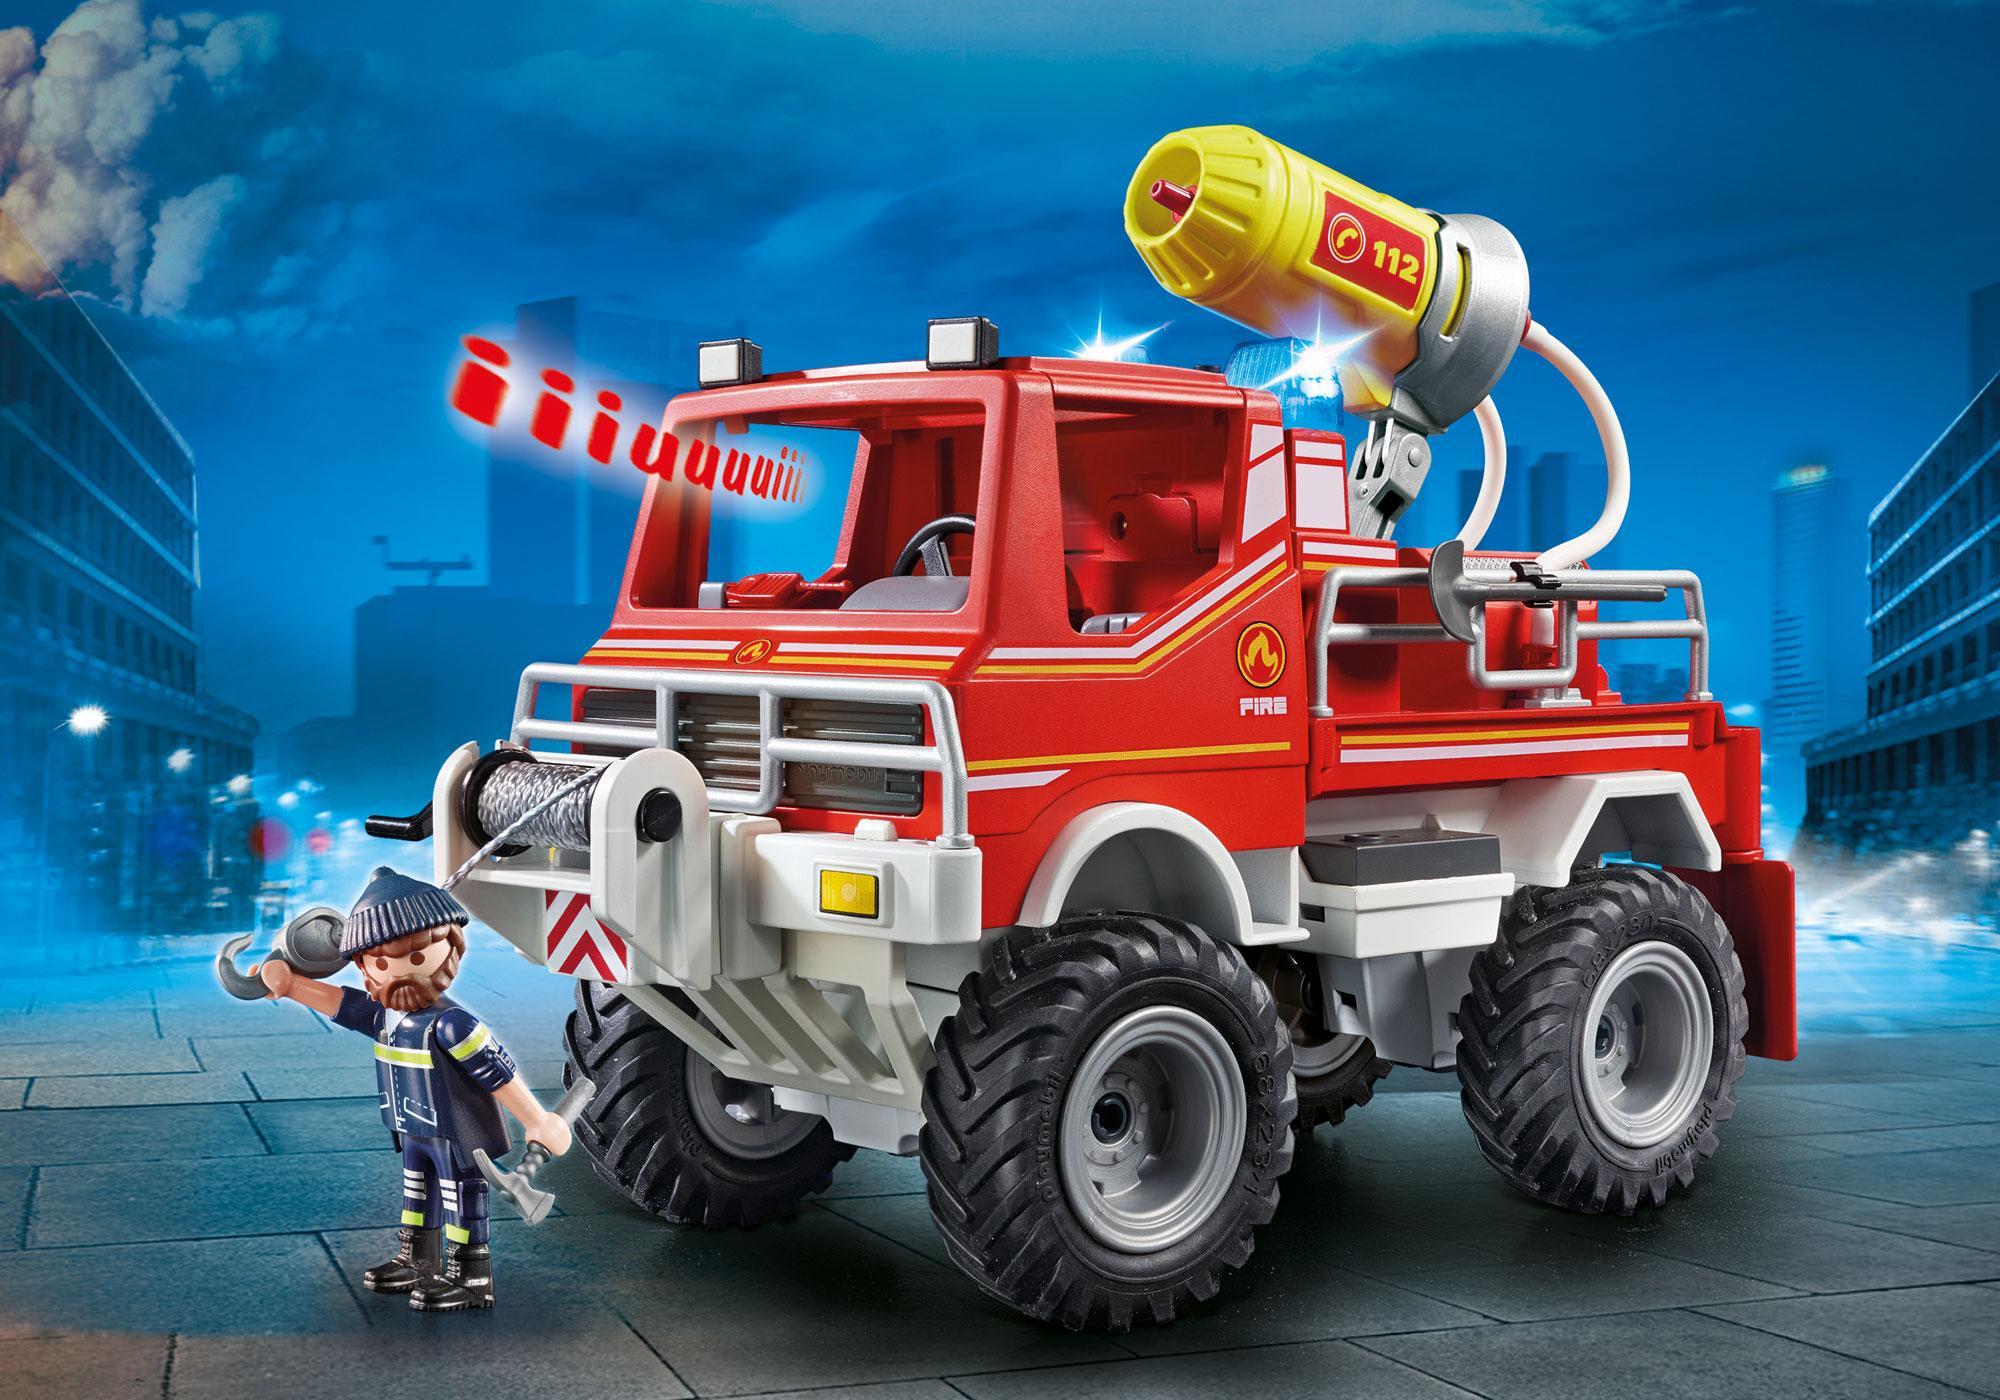 http://media.playmobil.com/i/playmobil/9466_product_detail/Camion spara acqua dei Vigili del Fuoco